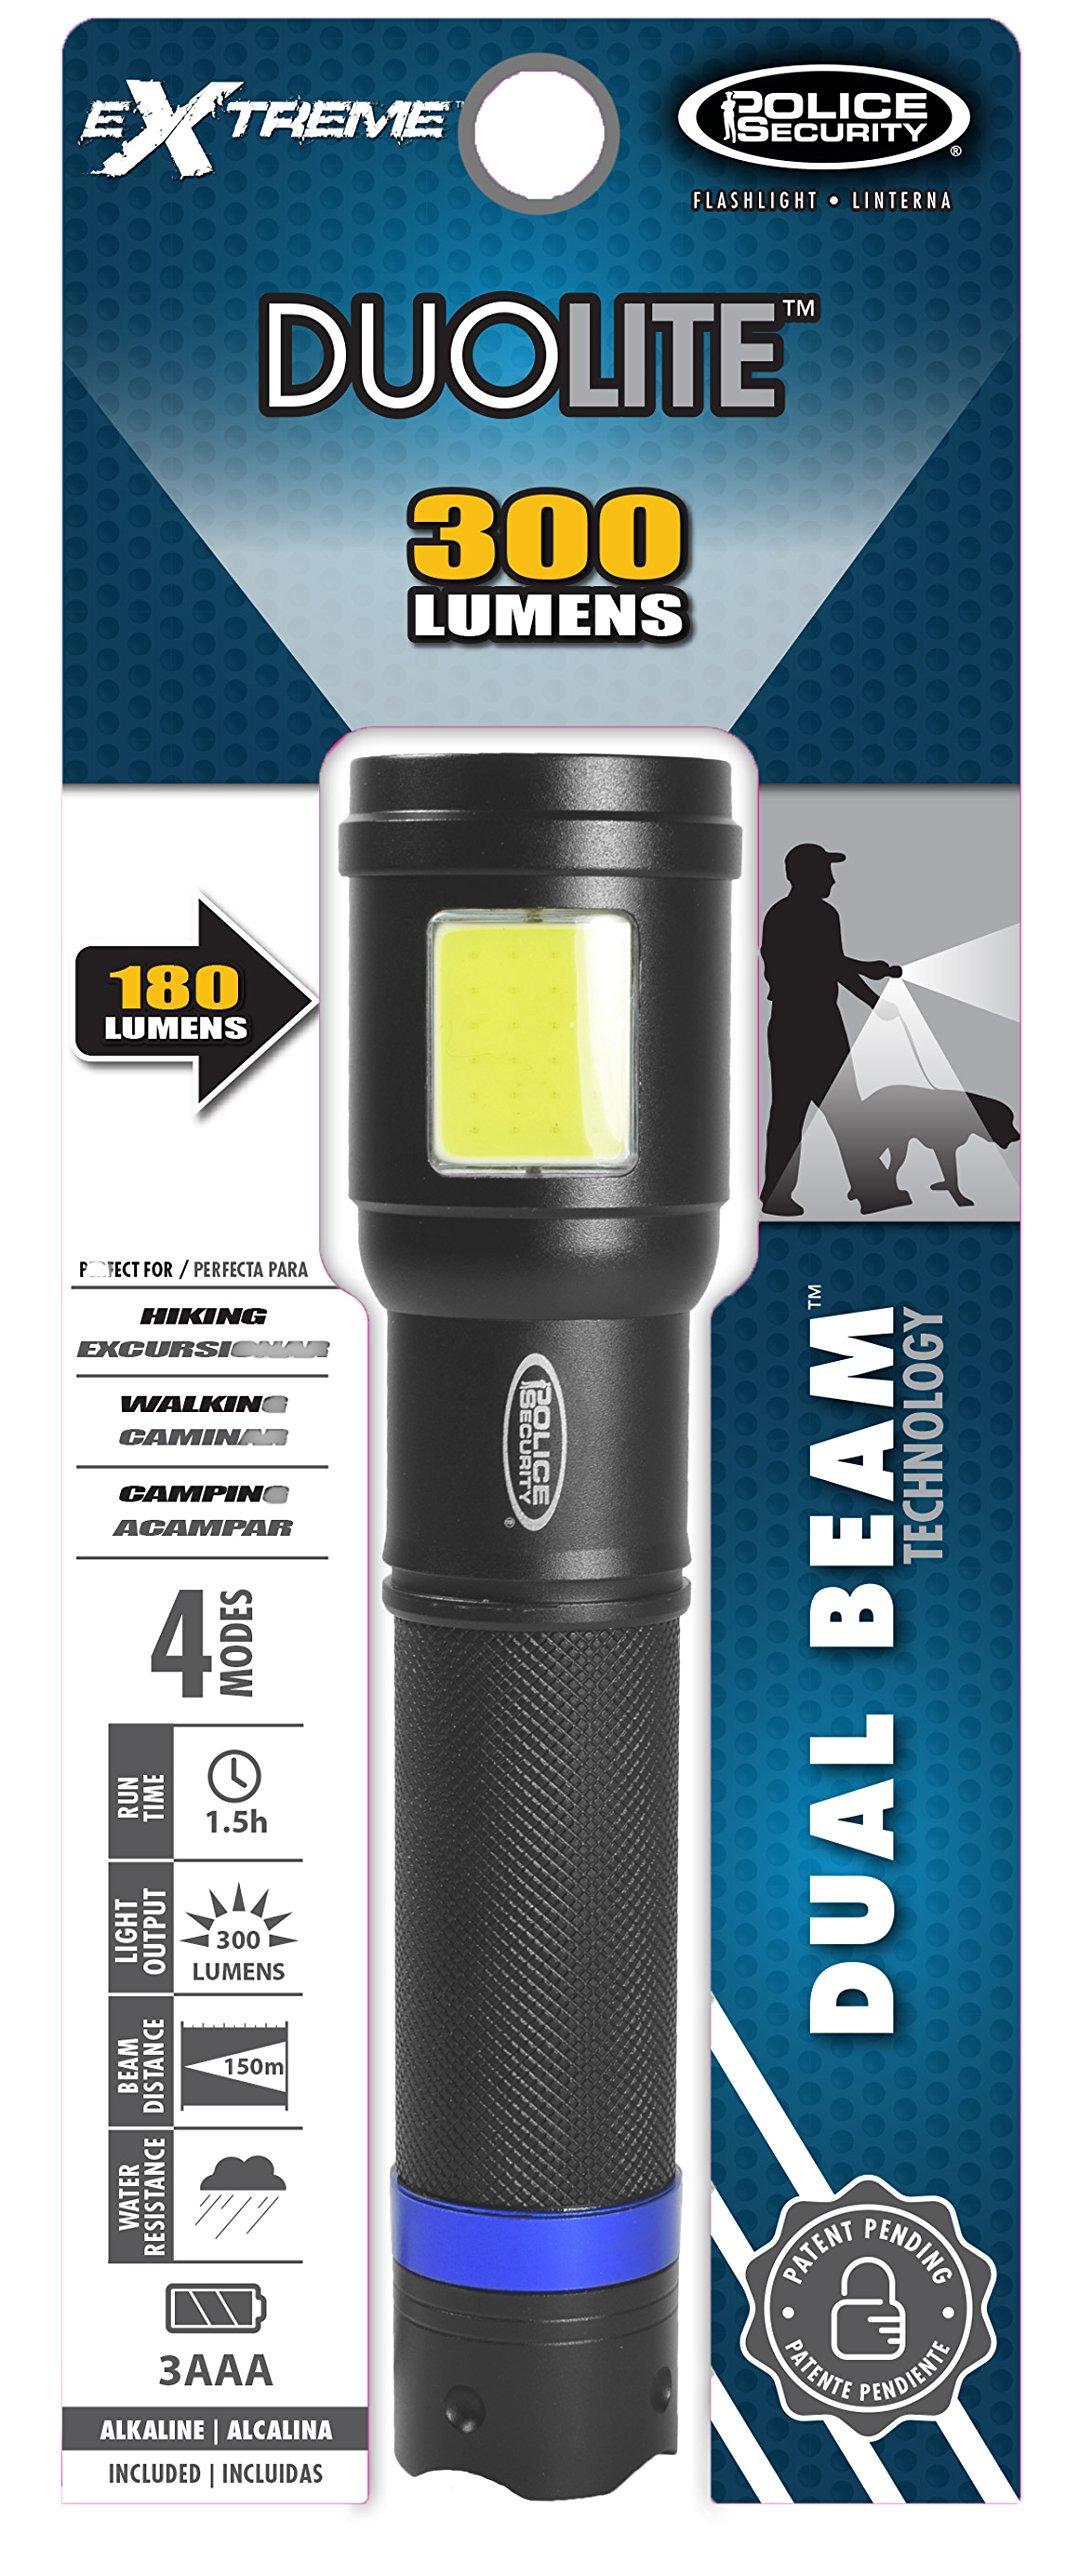 Police Security DuoLite 3AAA - Ultra Bright- Cree LED - Dual Utility Work Flashlight (Spotlight Beam and Area Light) - 300 Lumens - Everyday Use - Dog Walking, Hiking - Lights Your Path by Police Security Flashlights (Image #5)